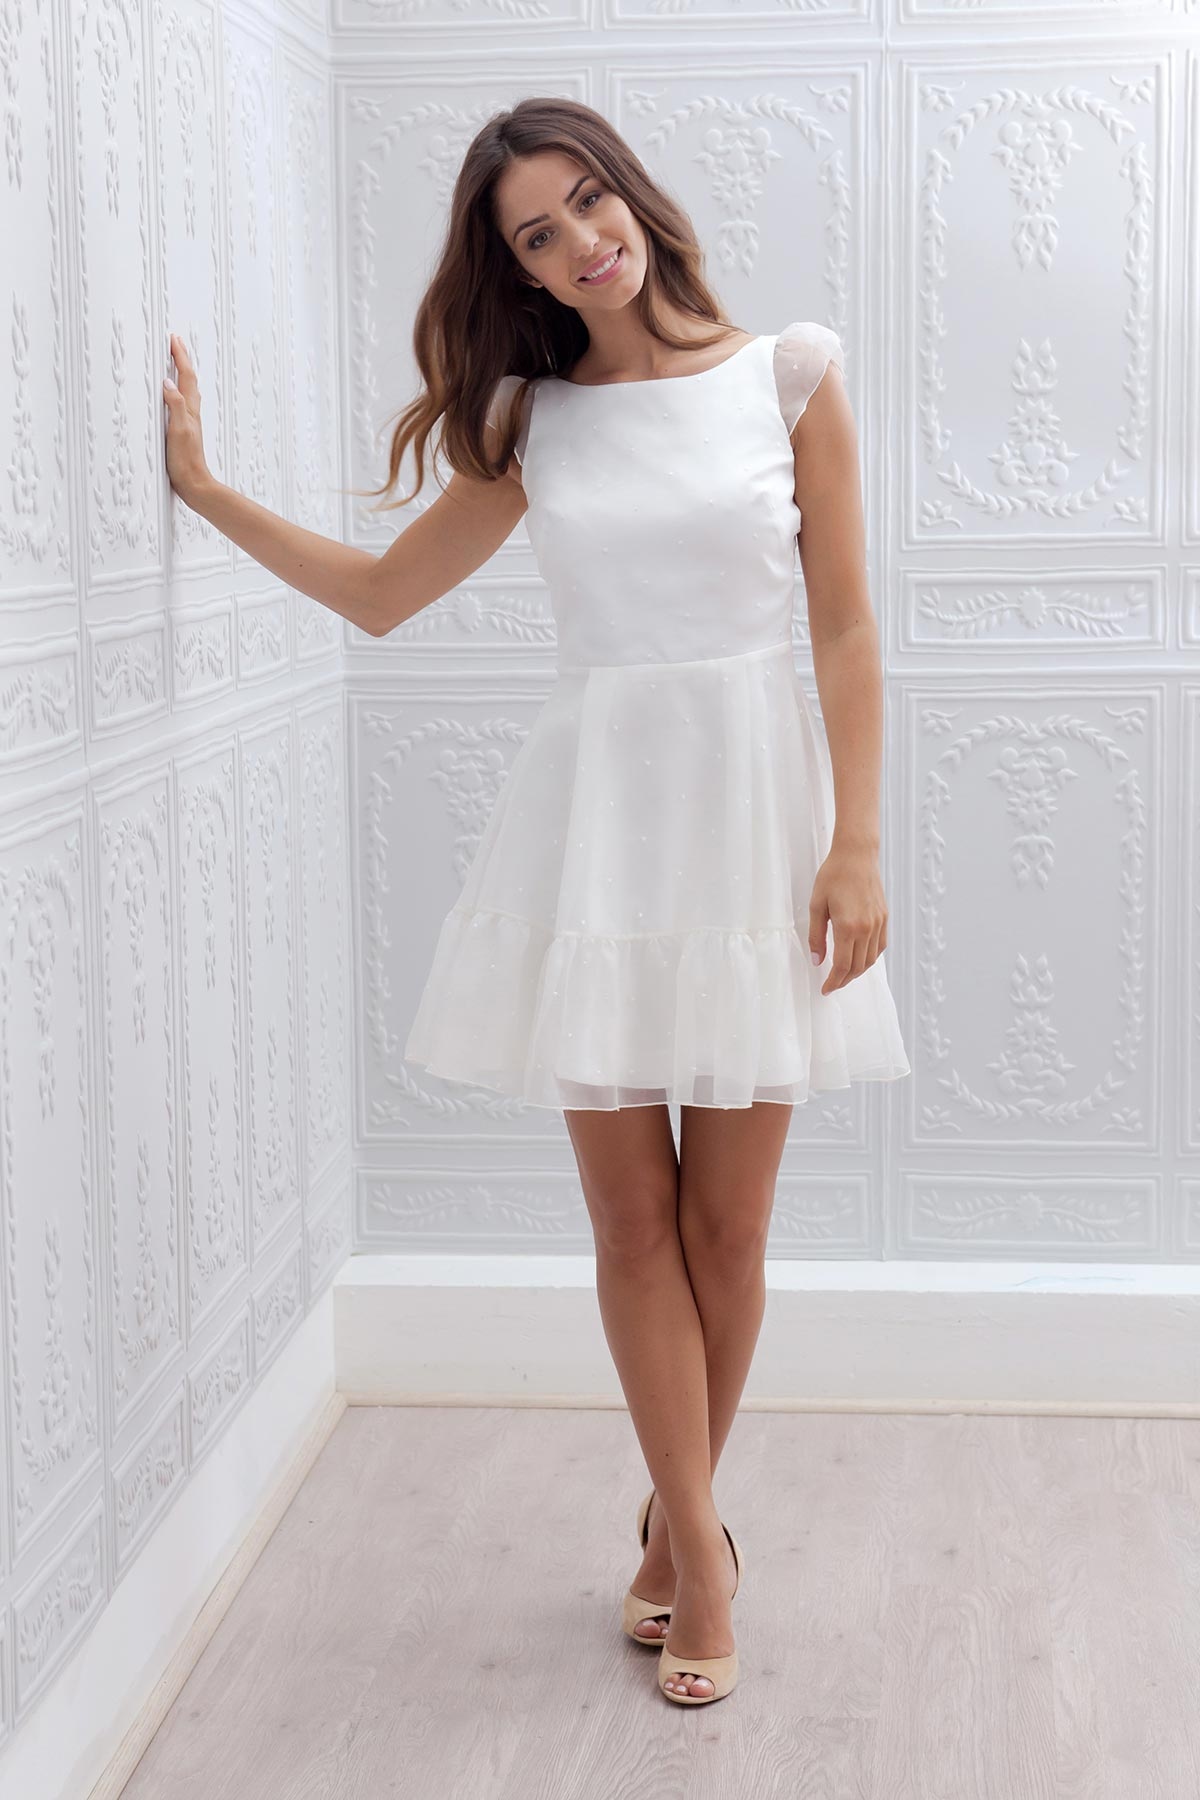 Marie Laporte collection 2015, Marie Laporte Collection 2015